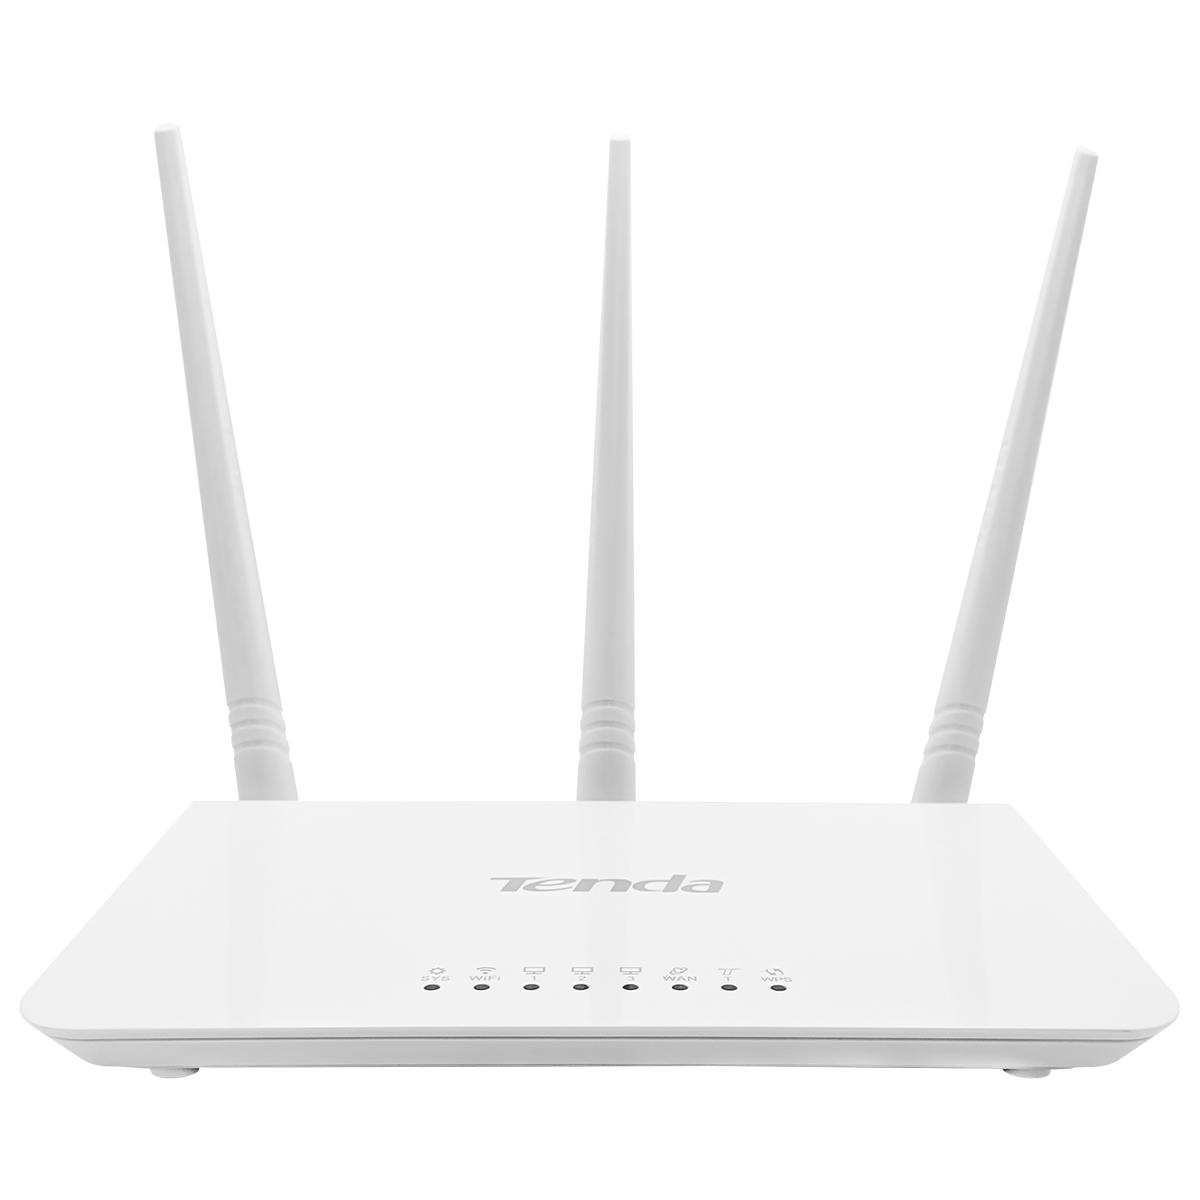 Wi-Fi роутер (маршрутизатор) Tenda F3 *300 Мбит/с